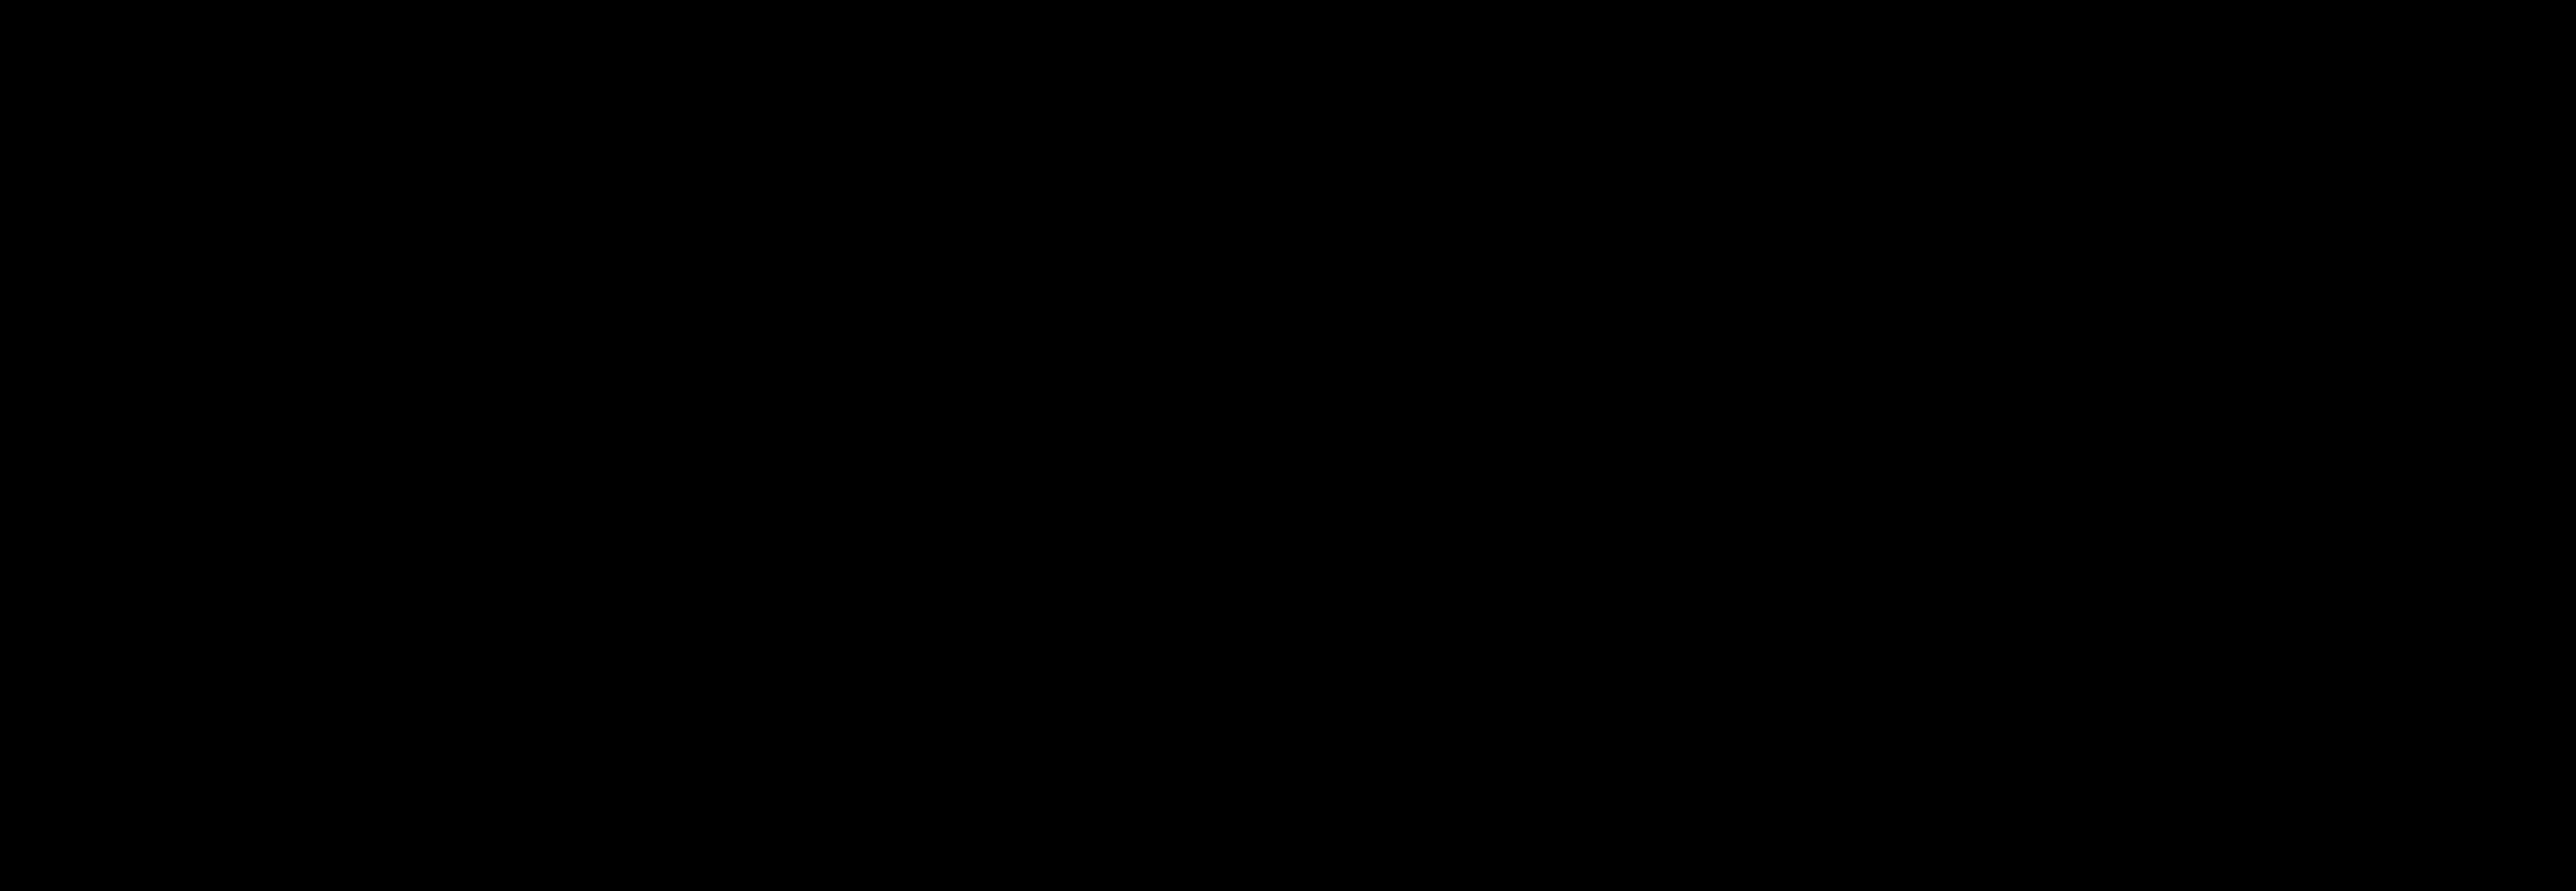 black-on-transparent